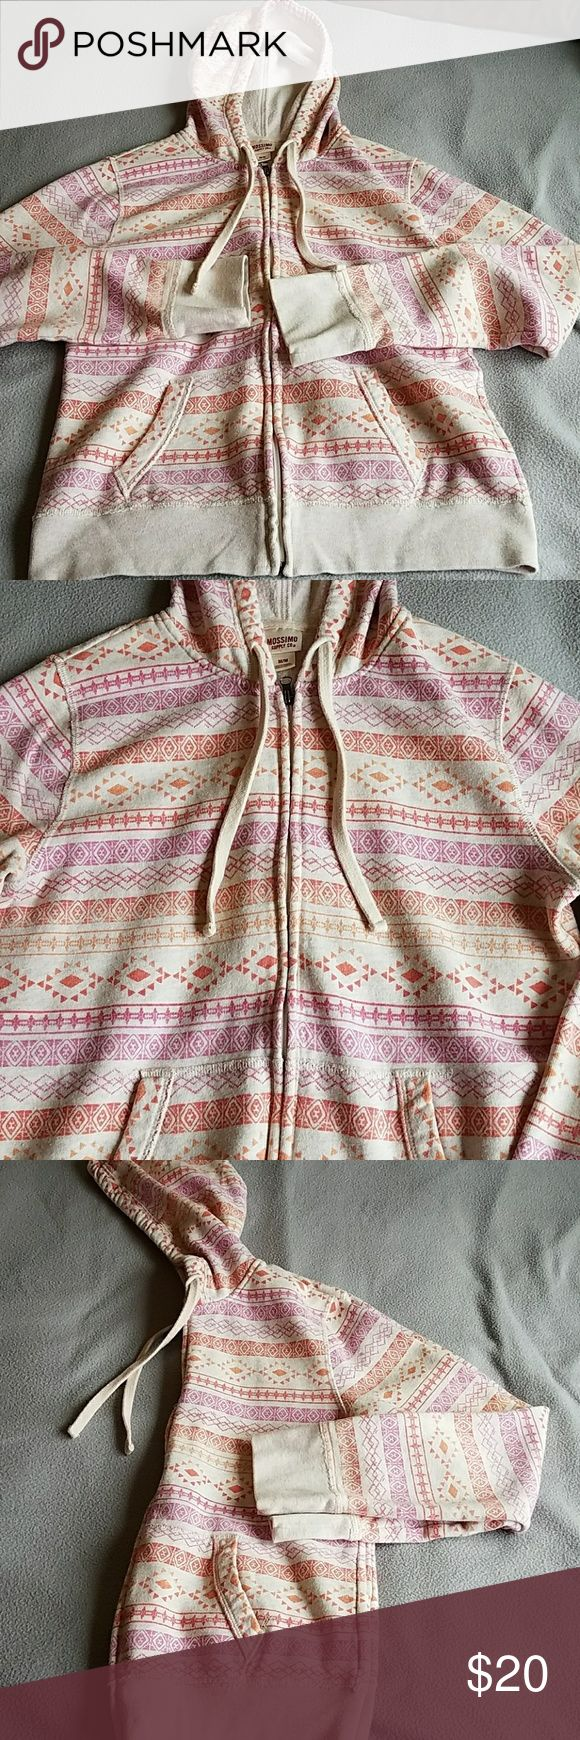 Zip up sweatshirt Cream background, pink and orange design. Mossimo Supply Co Tops Sweatshirts & Hoodies